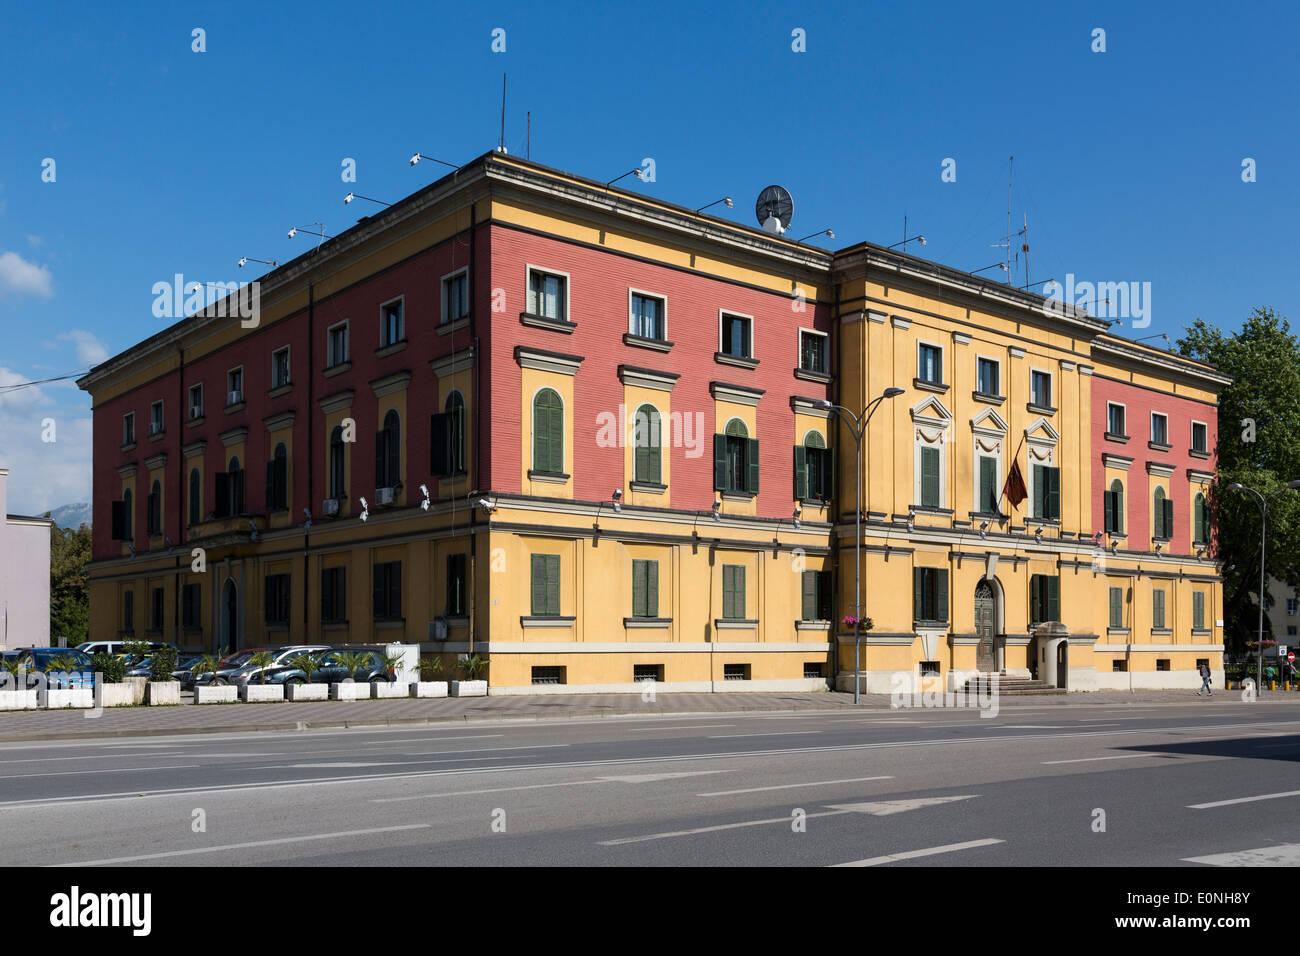 ministerial building near Skanderbeg Square, Tirana, Albania - Stock Image